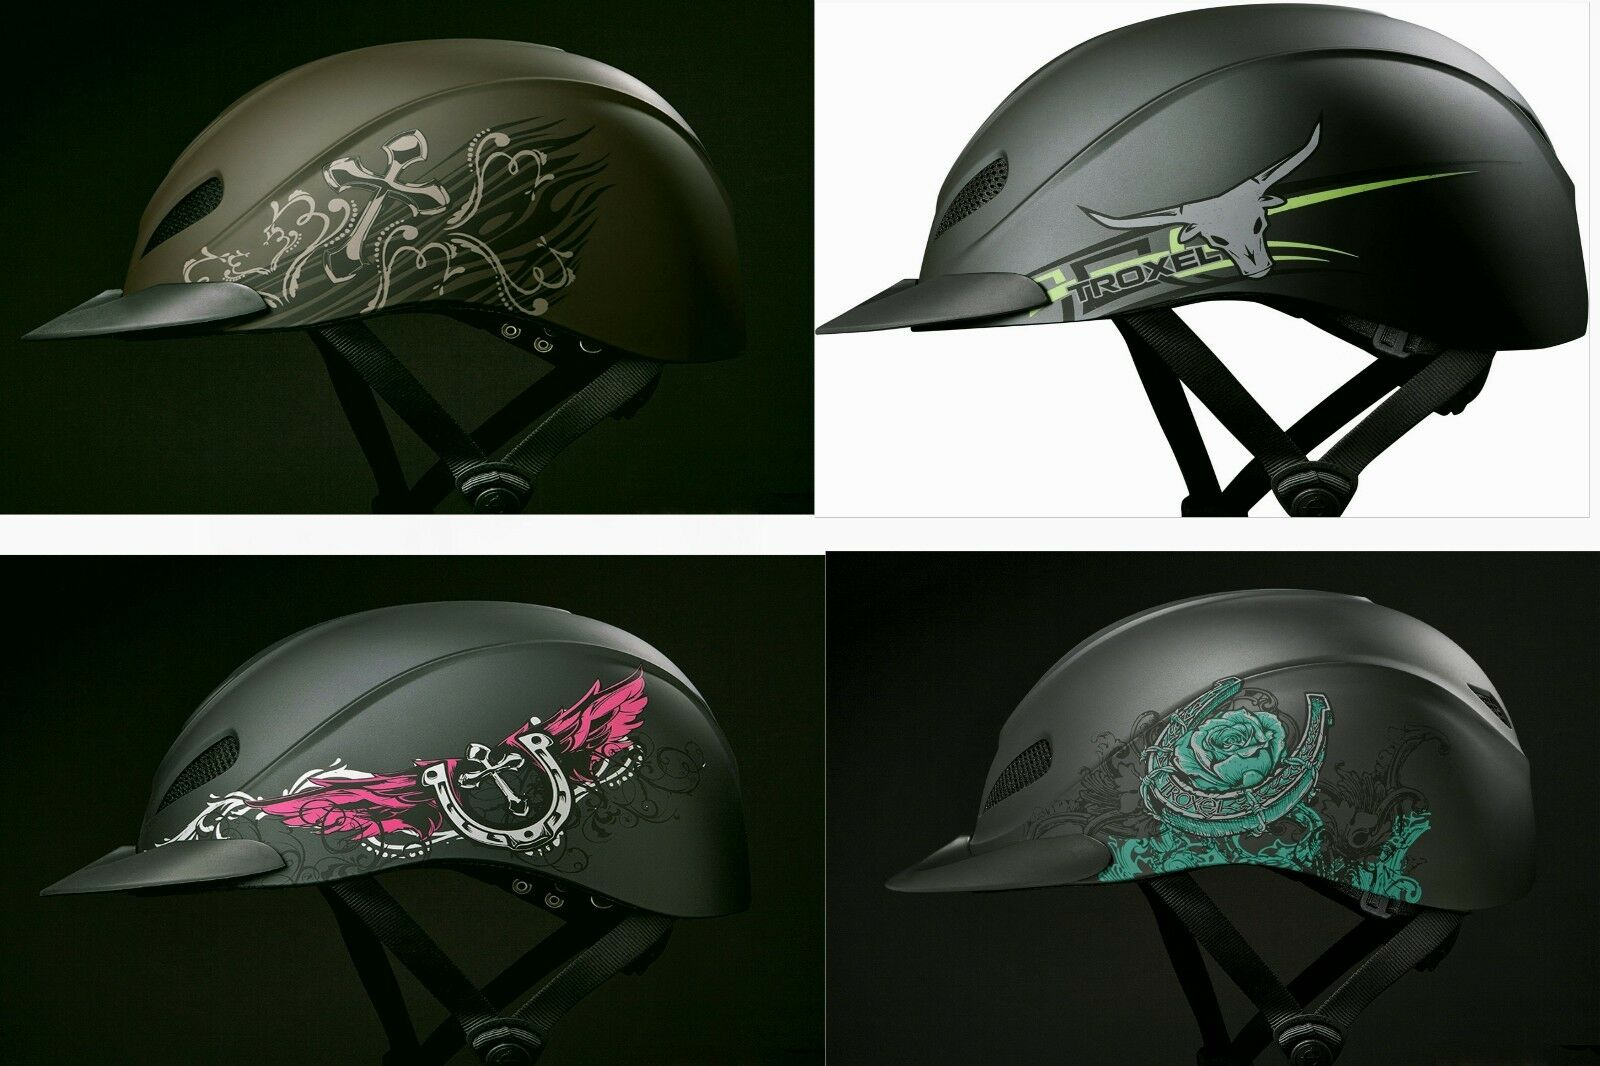 Troxel REBEL Safety Riding Training Helmet Western English Cross Turquoise pink